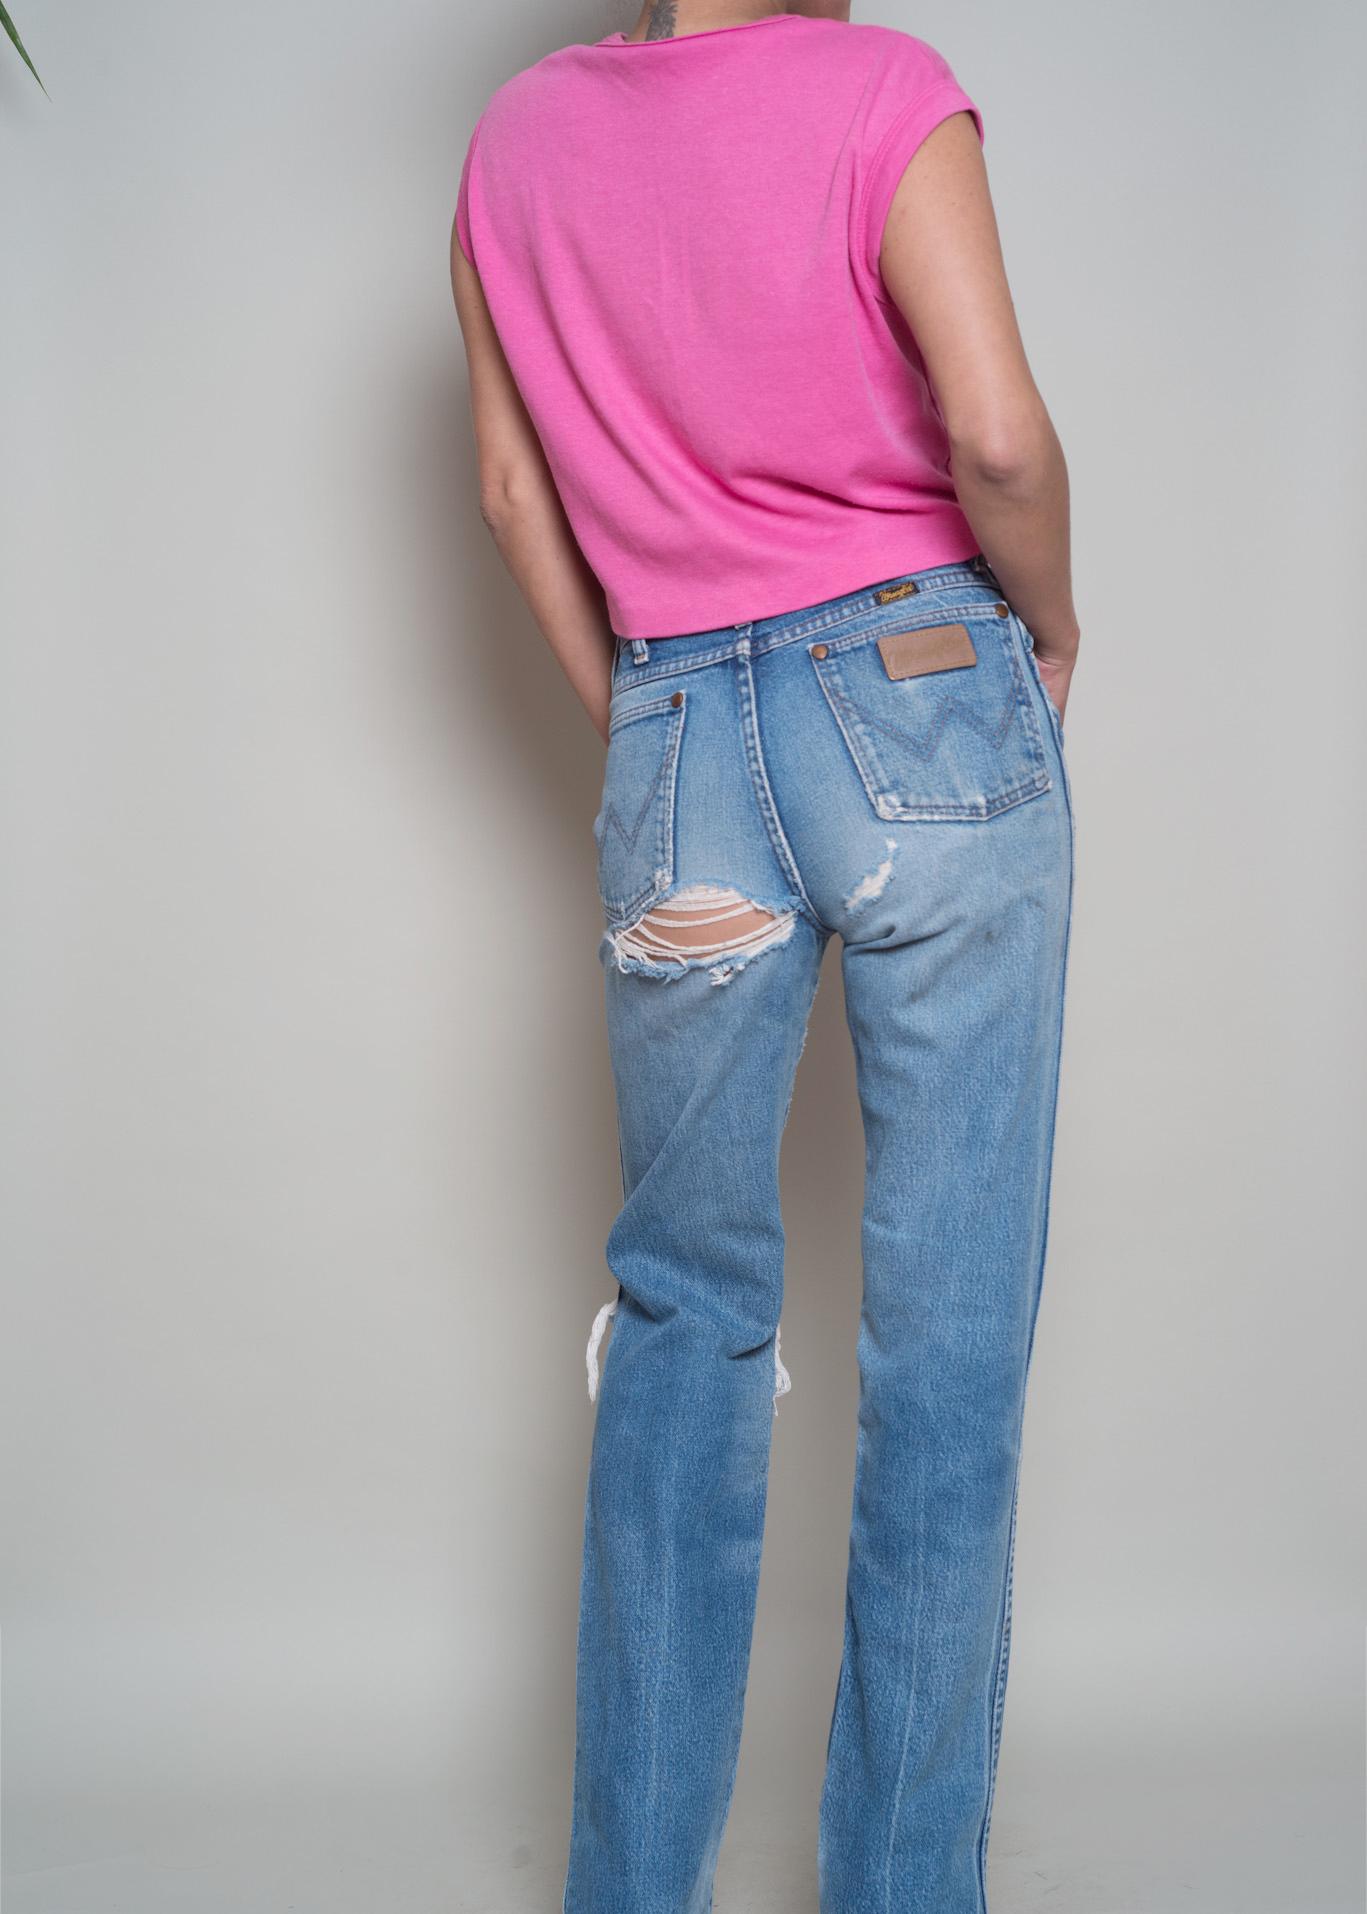 5421a6e7 1980s// WRANGLER High Waist Straight Leg Perfectly Worn Jeans// 28 ...